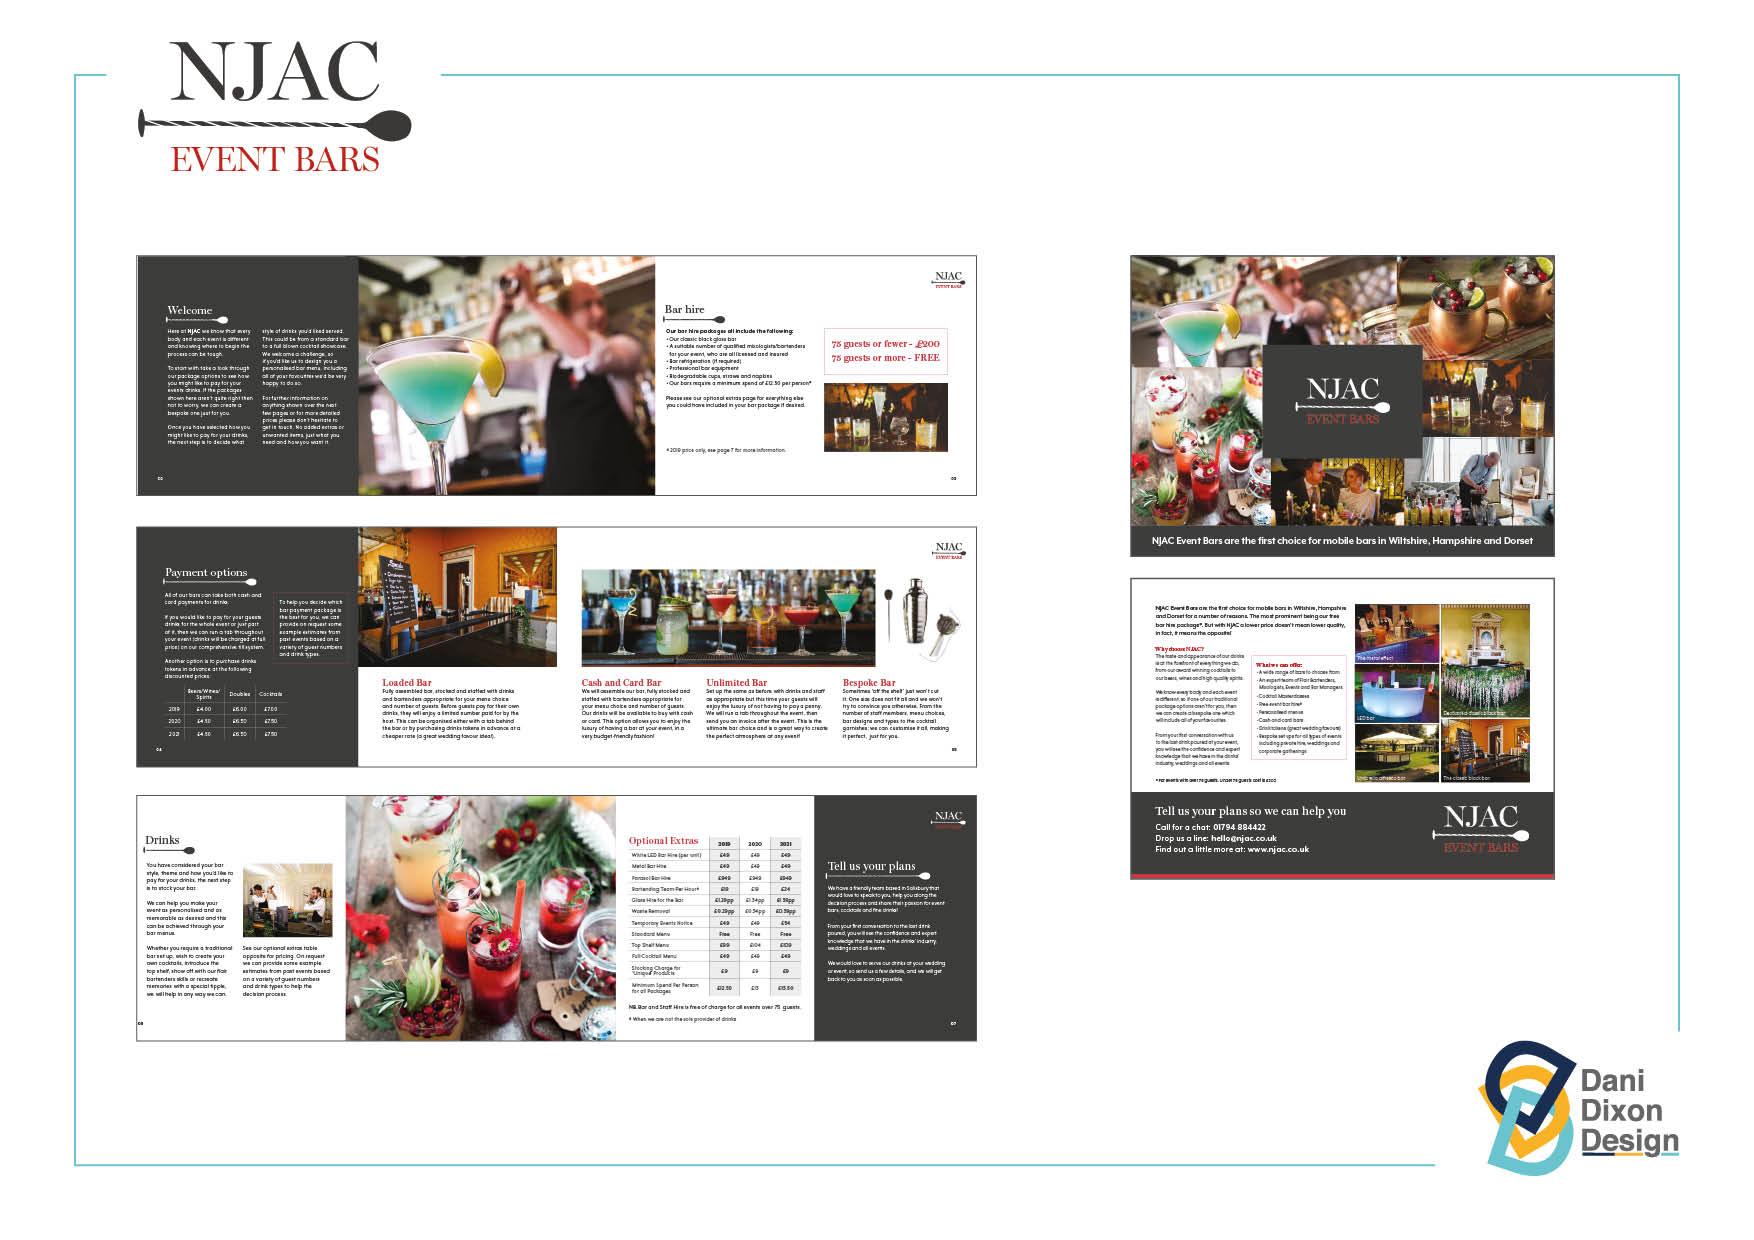 NJAC brand development